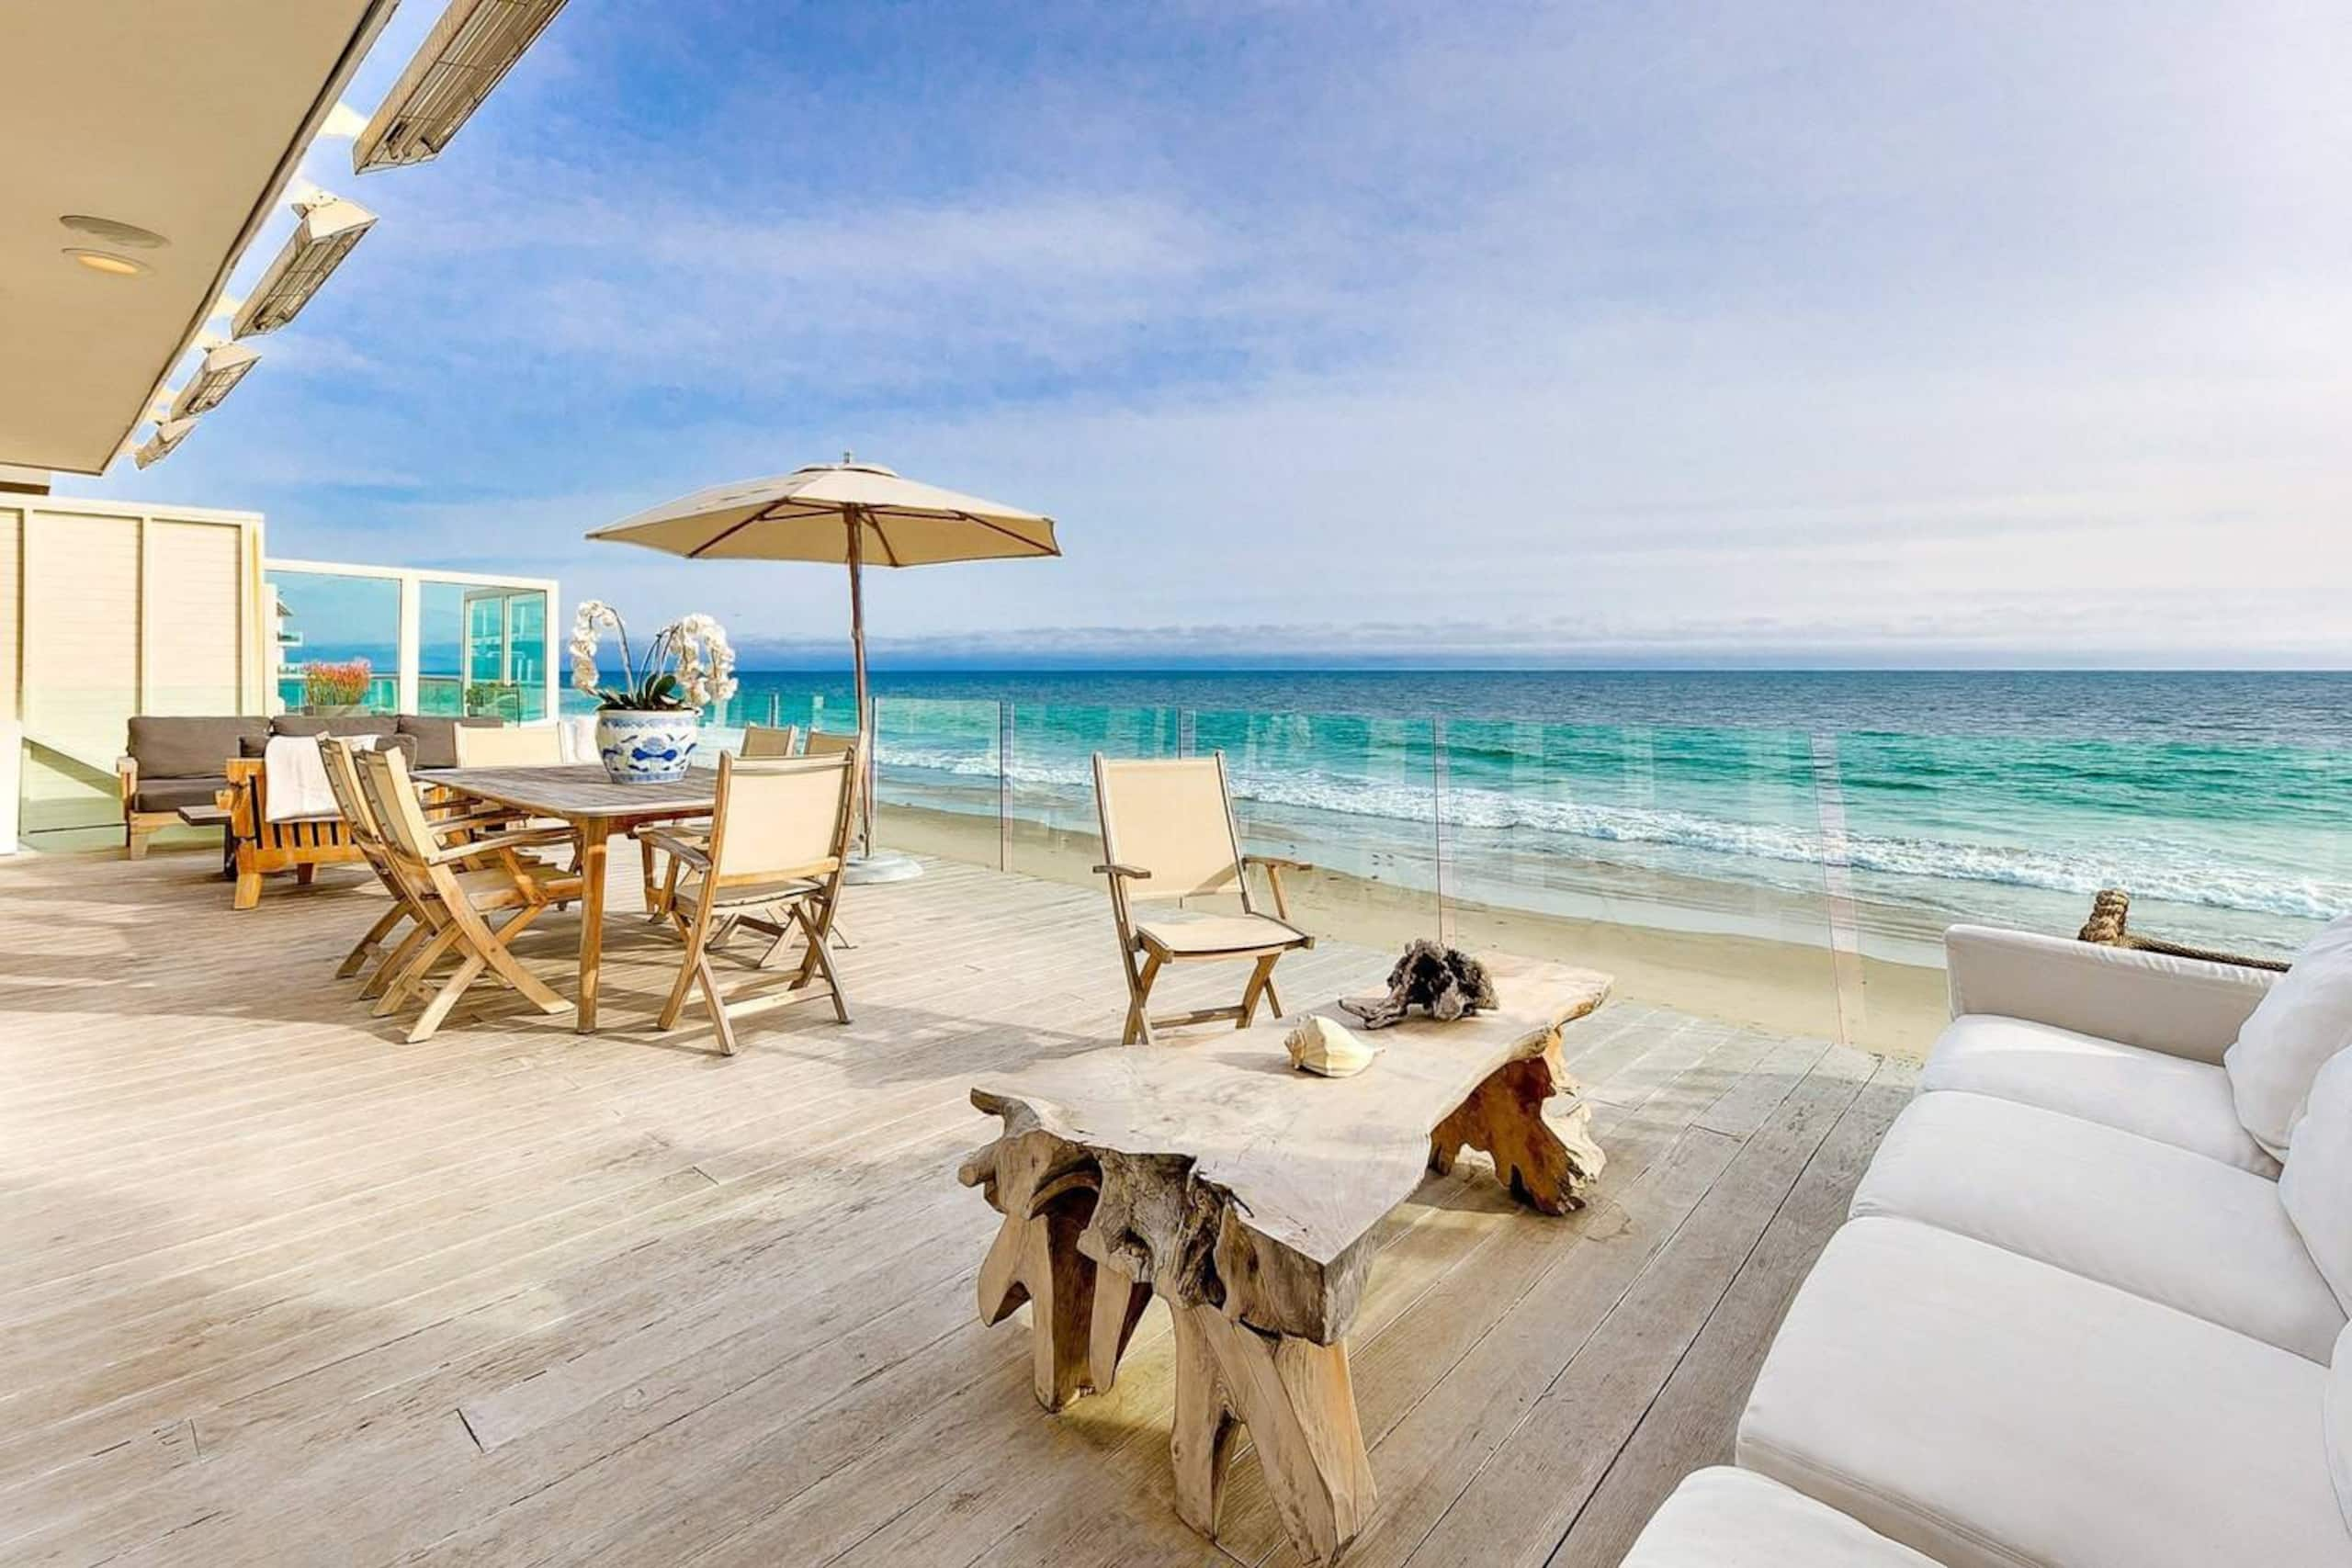 Apartment Villa Shawaiz - Beachfront Villa with 5 beds  photo 20136339